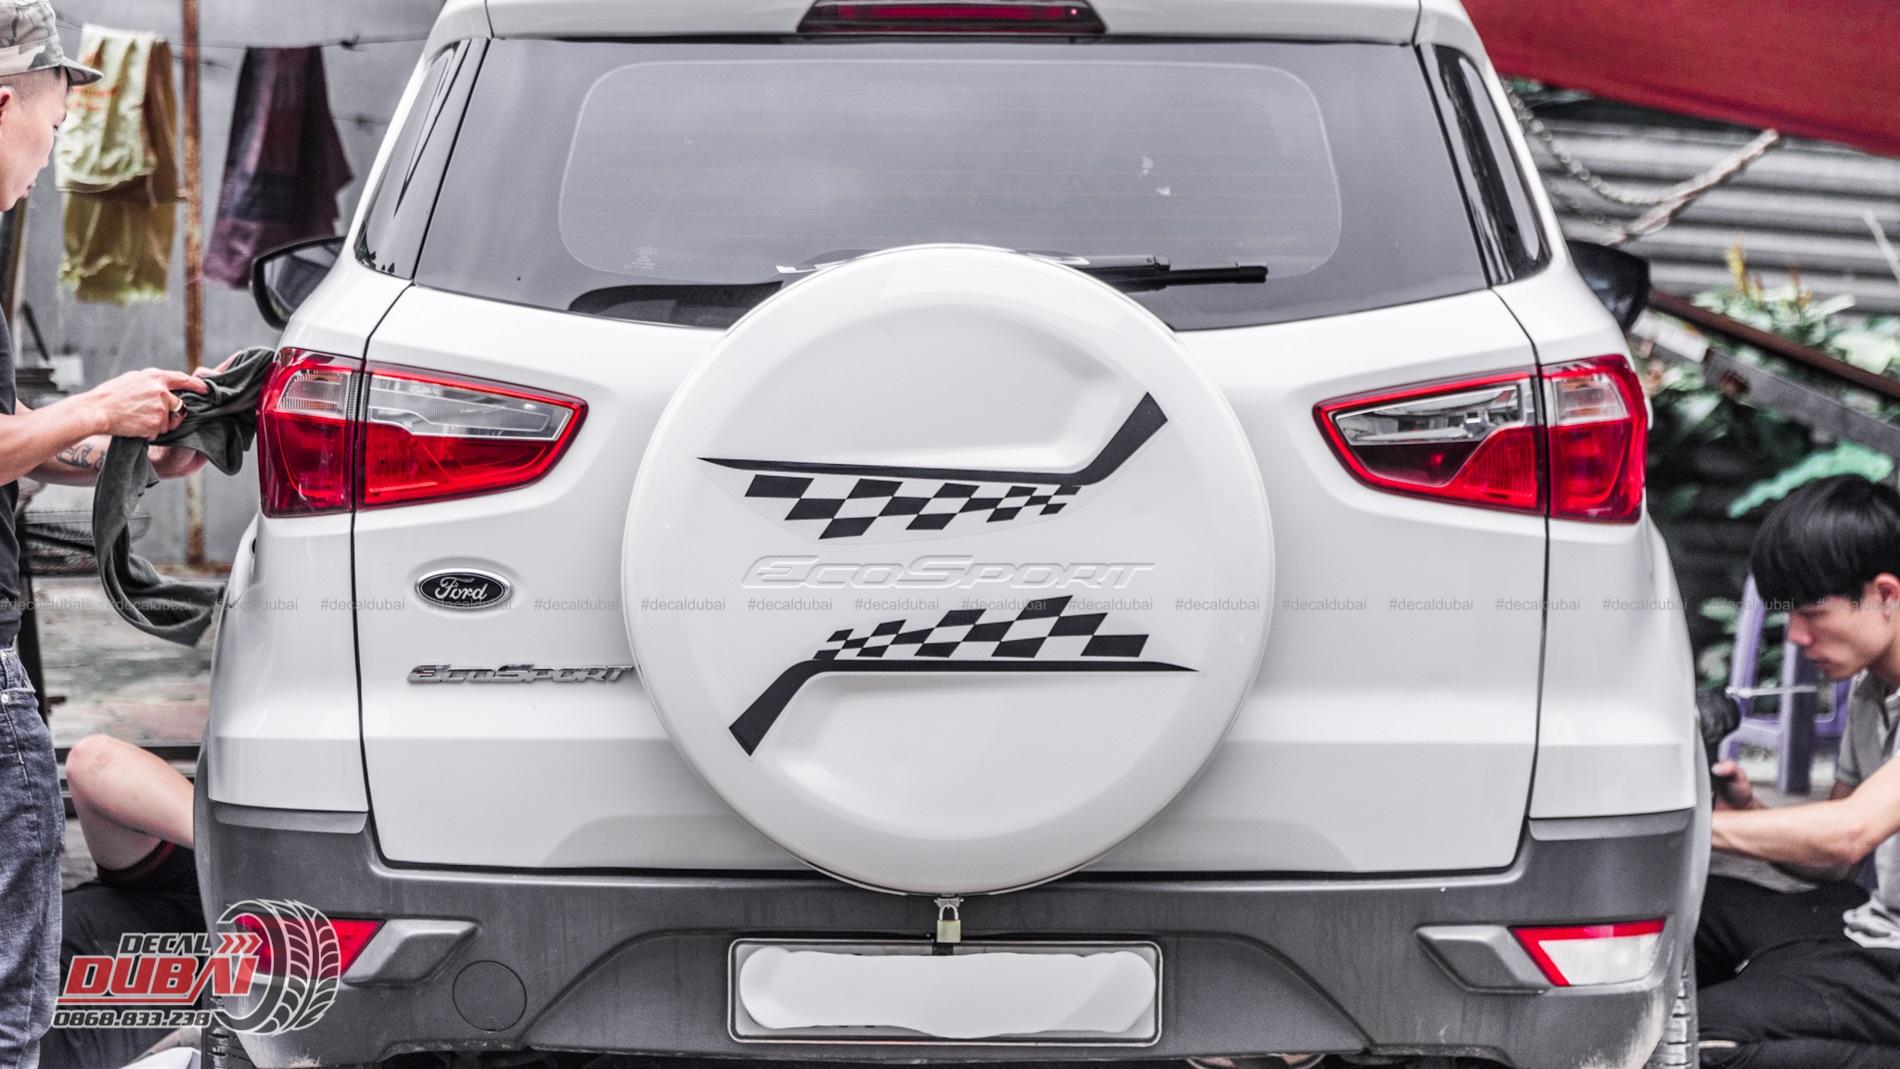 Tem-Xe-Ecosport-0002.2-450